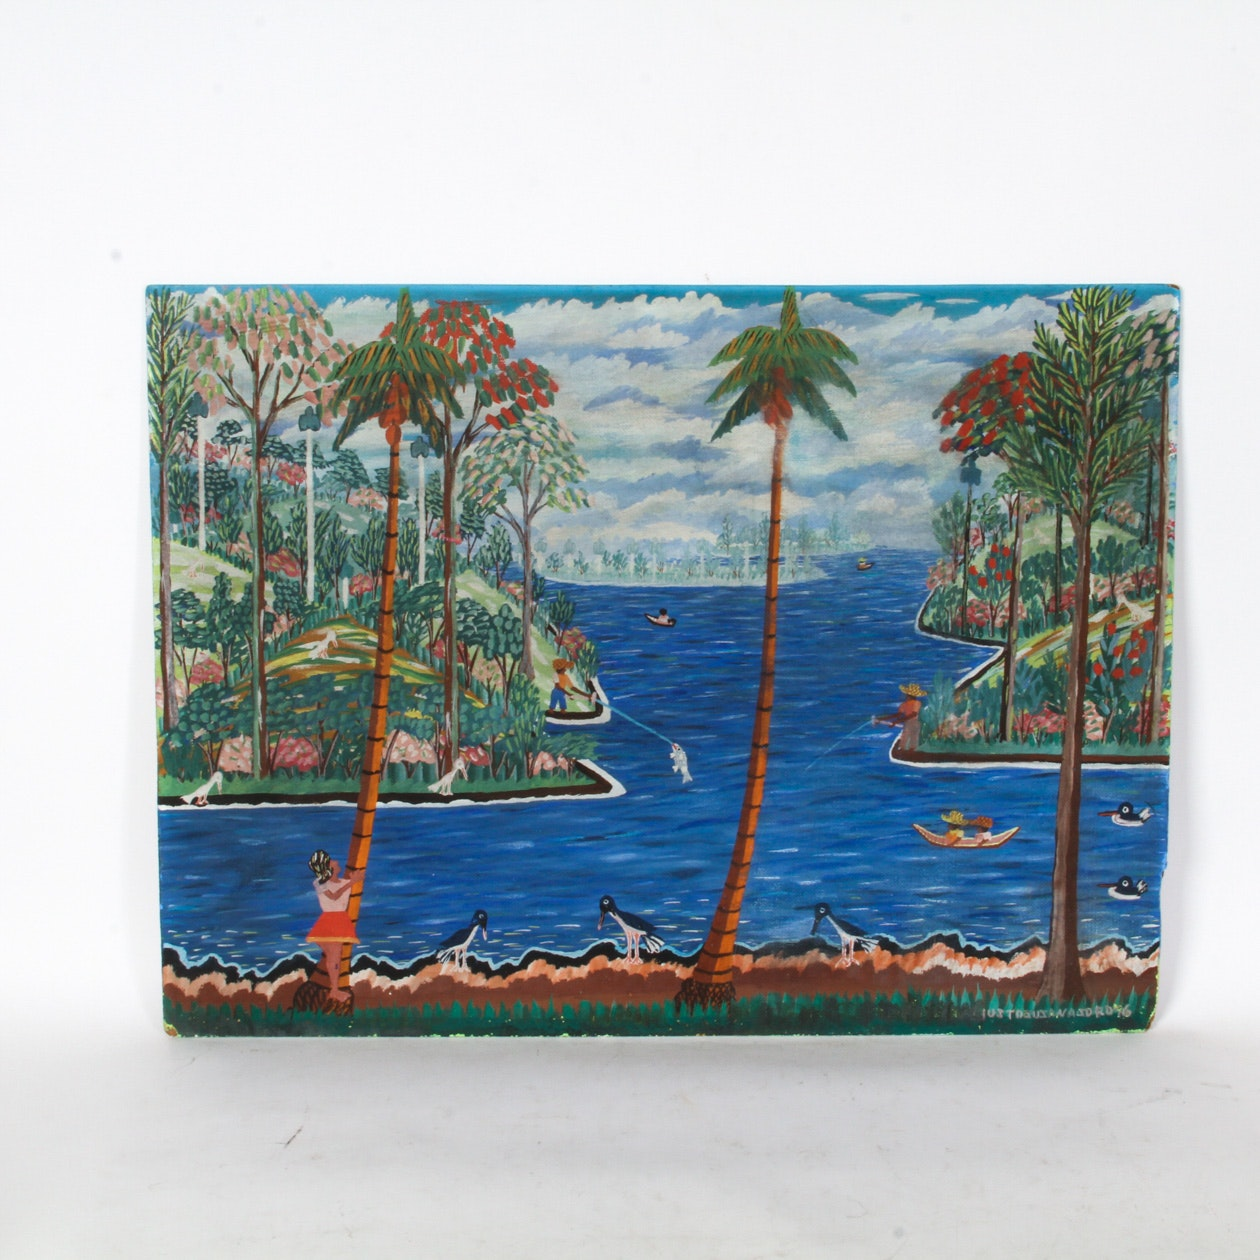 Justo Susana Signed Oil Painting of Haiti on Board